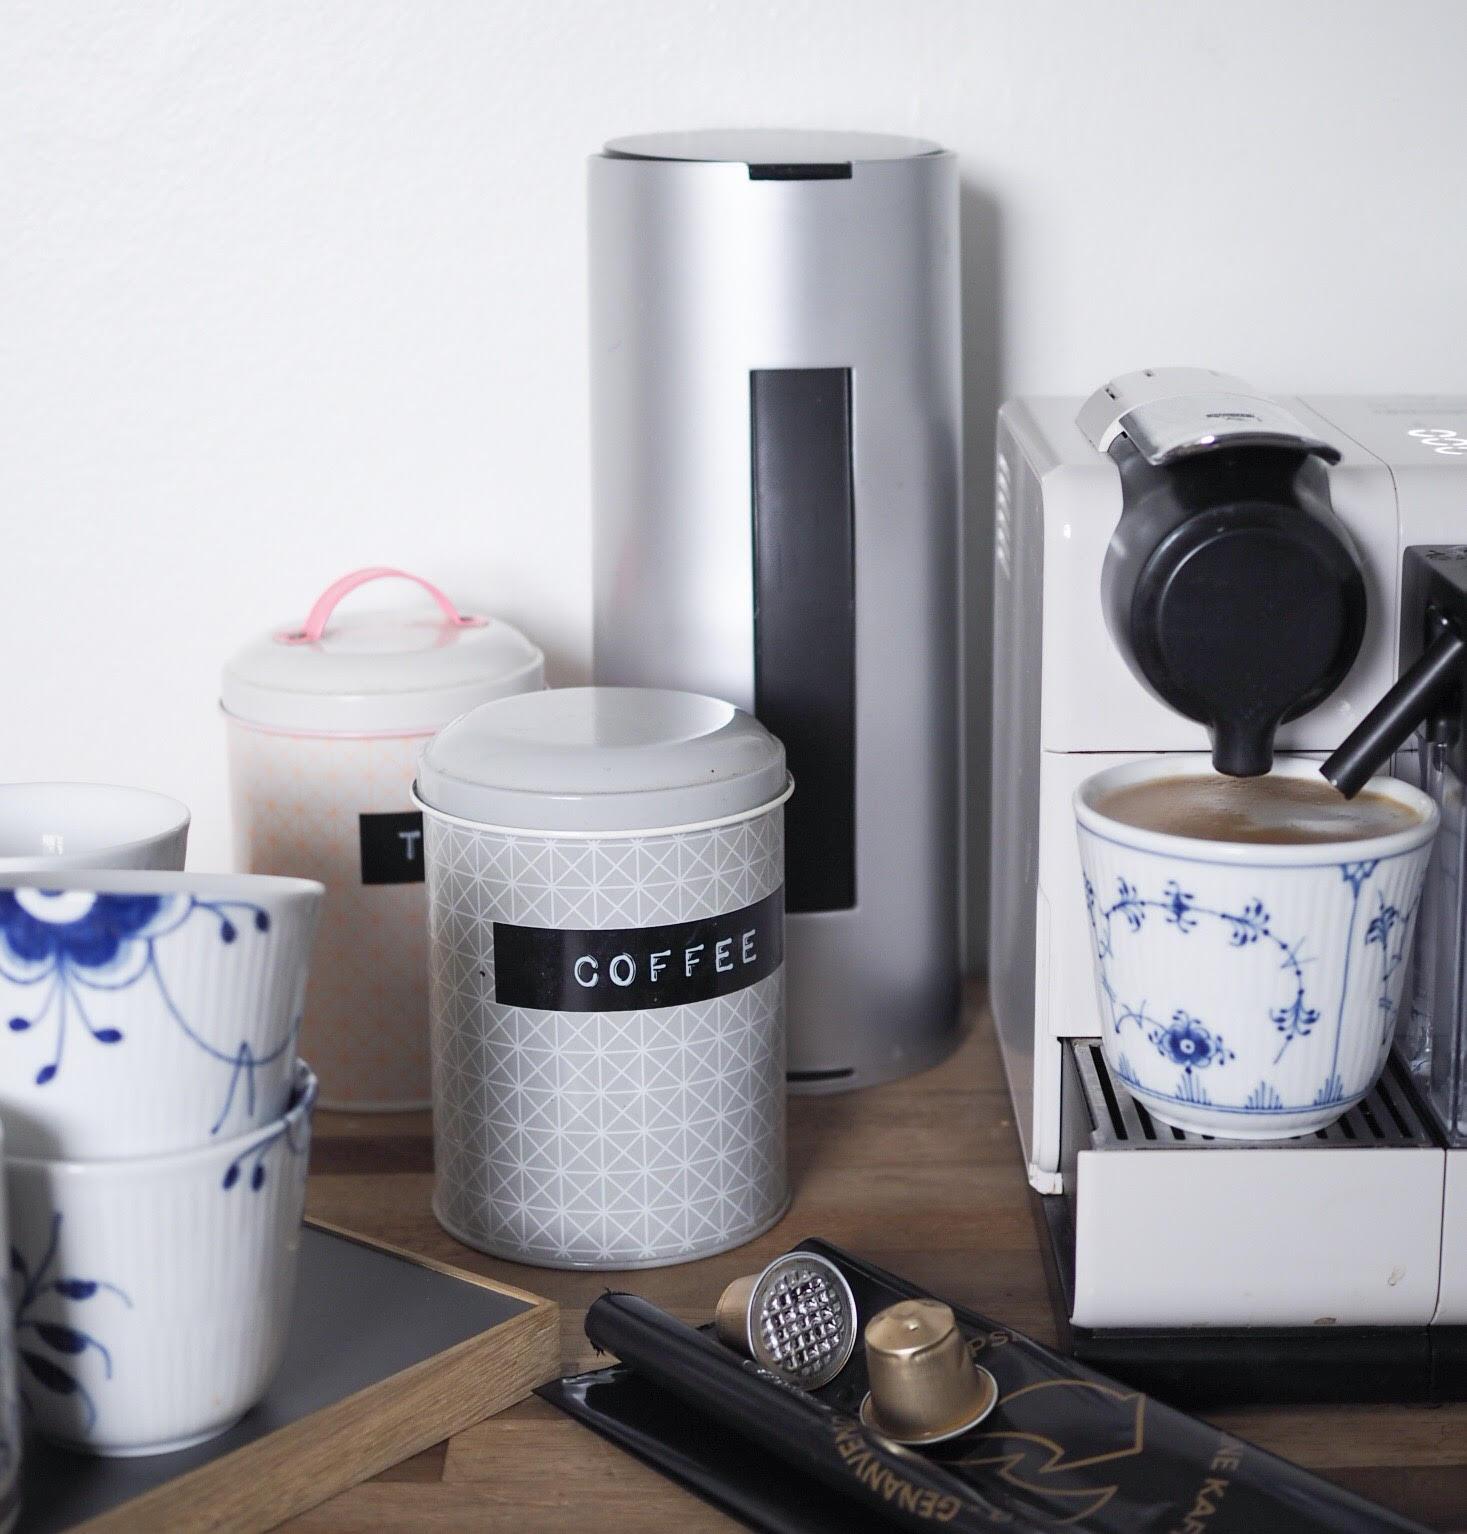 Nespresso kaffemaskine med mælkeskummer - model Lattissima. Bøtter fra Bloomingville og kaffekopper fra Royal Copenhagen. Holder til brugte kapsler og pose til genanvendelse